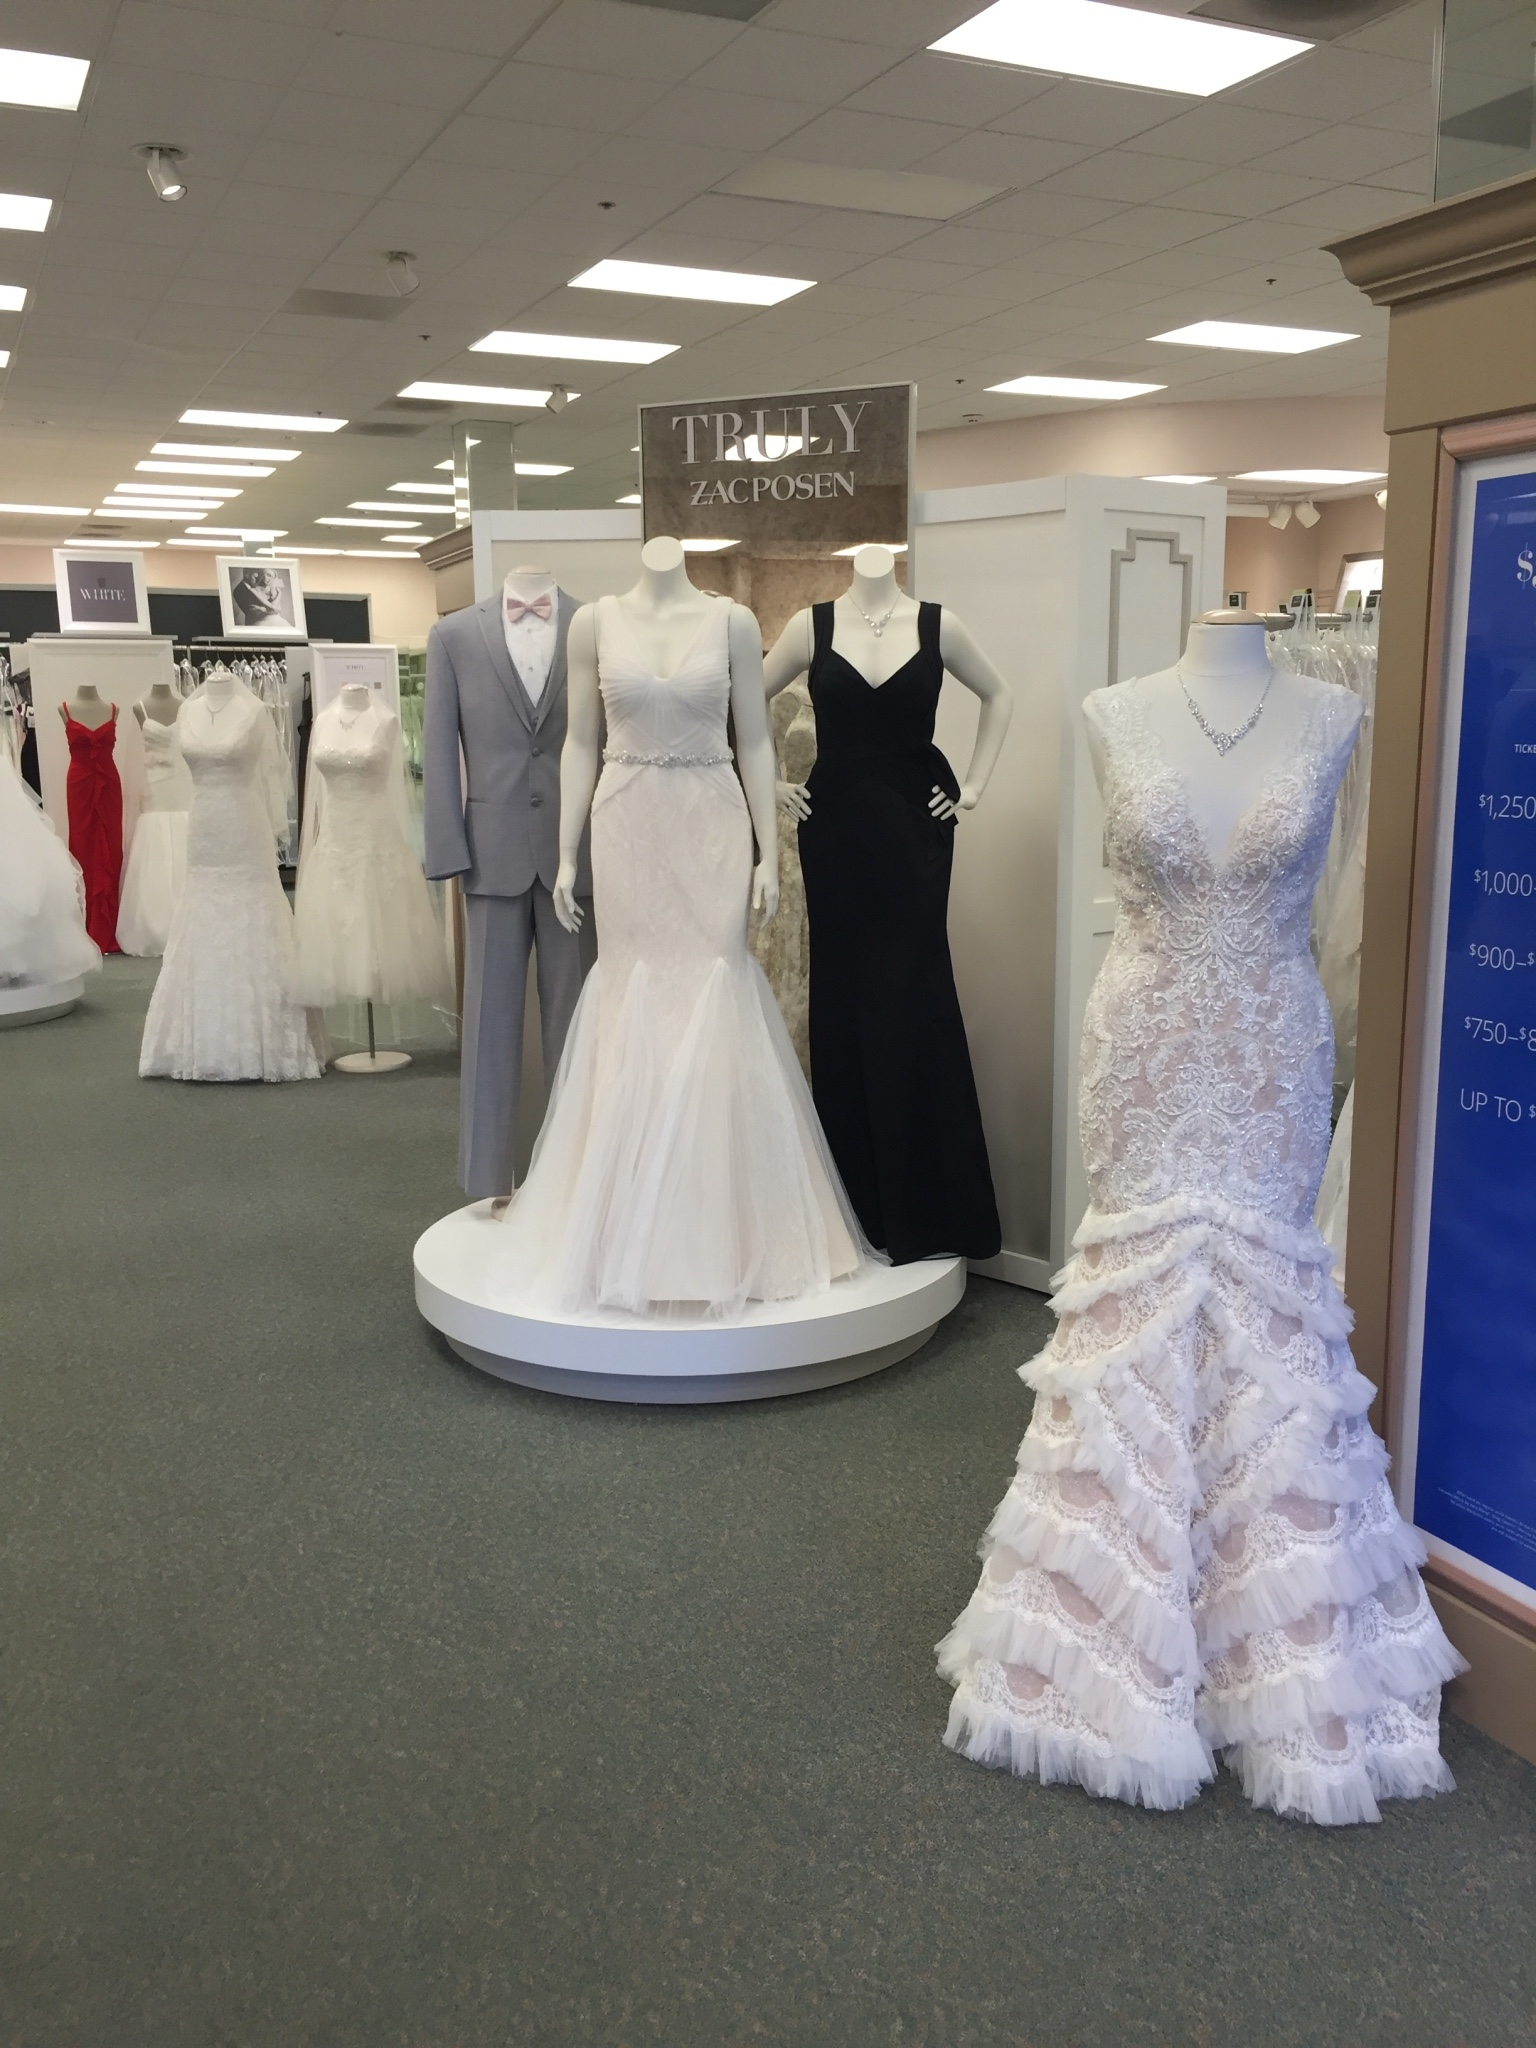 David S Bridal 9125 Sw Cascade Ave Ste 100 Beaverton Or